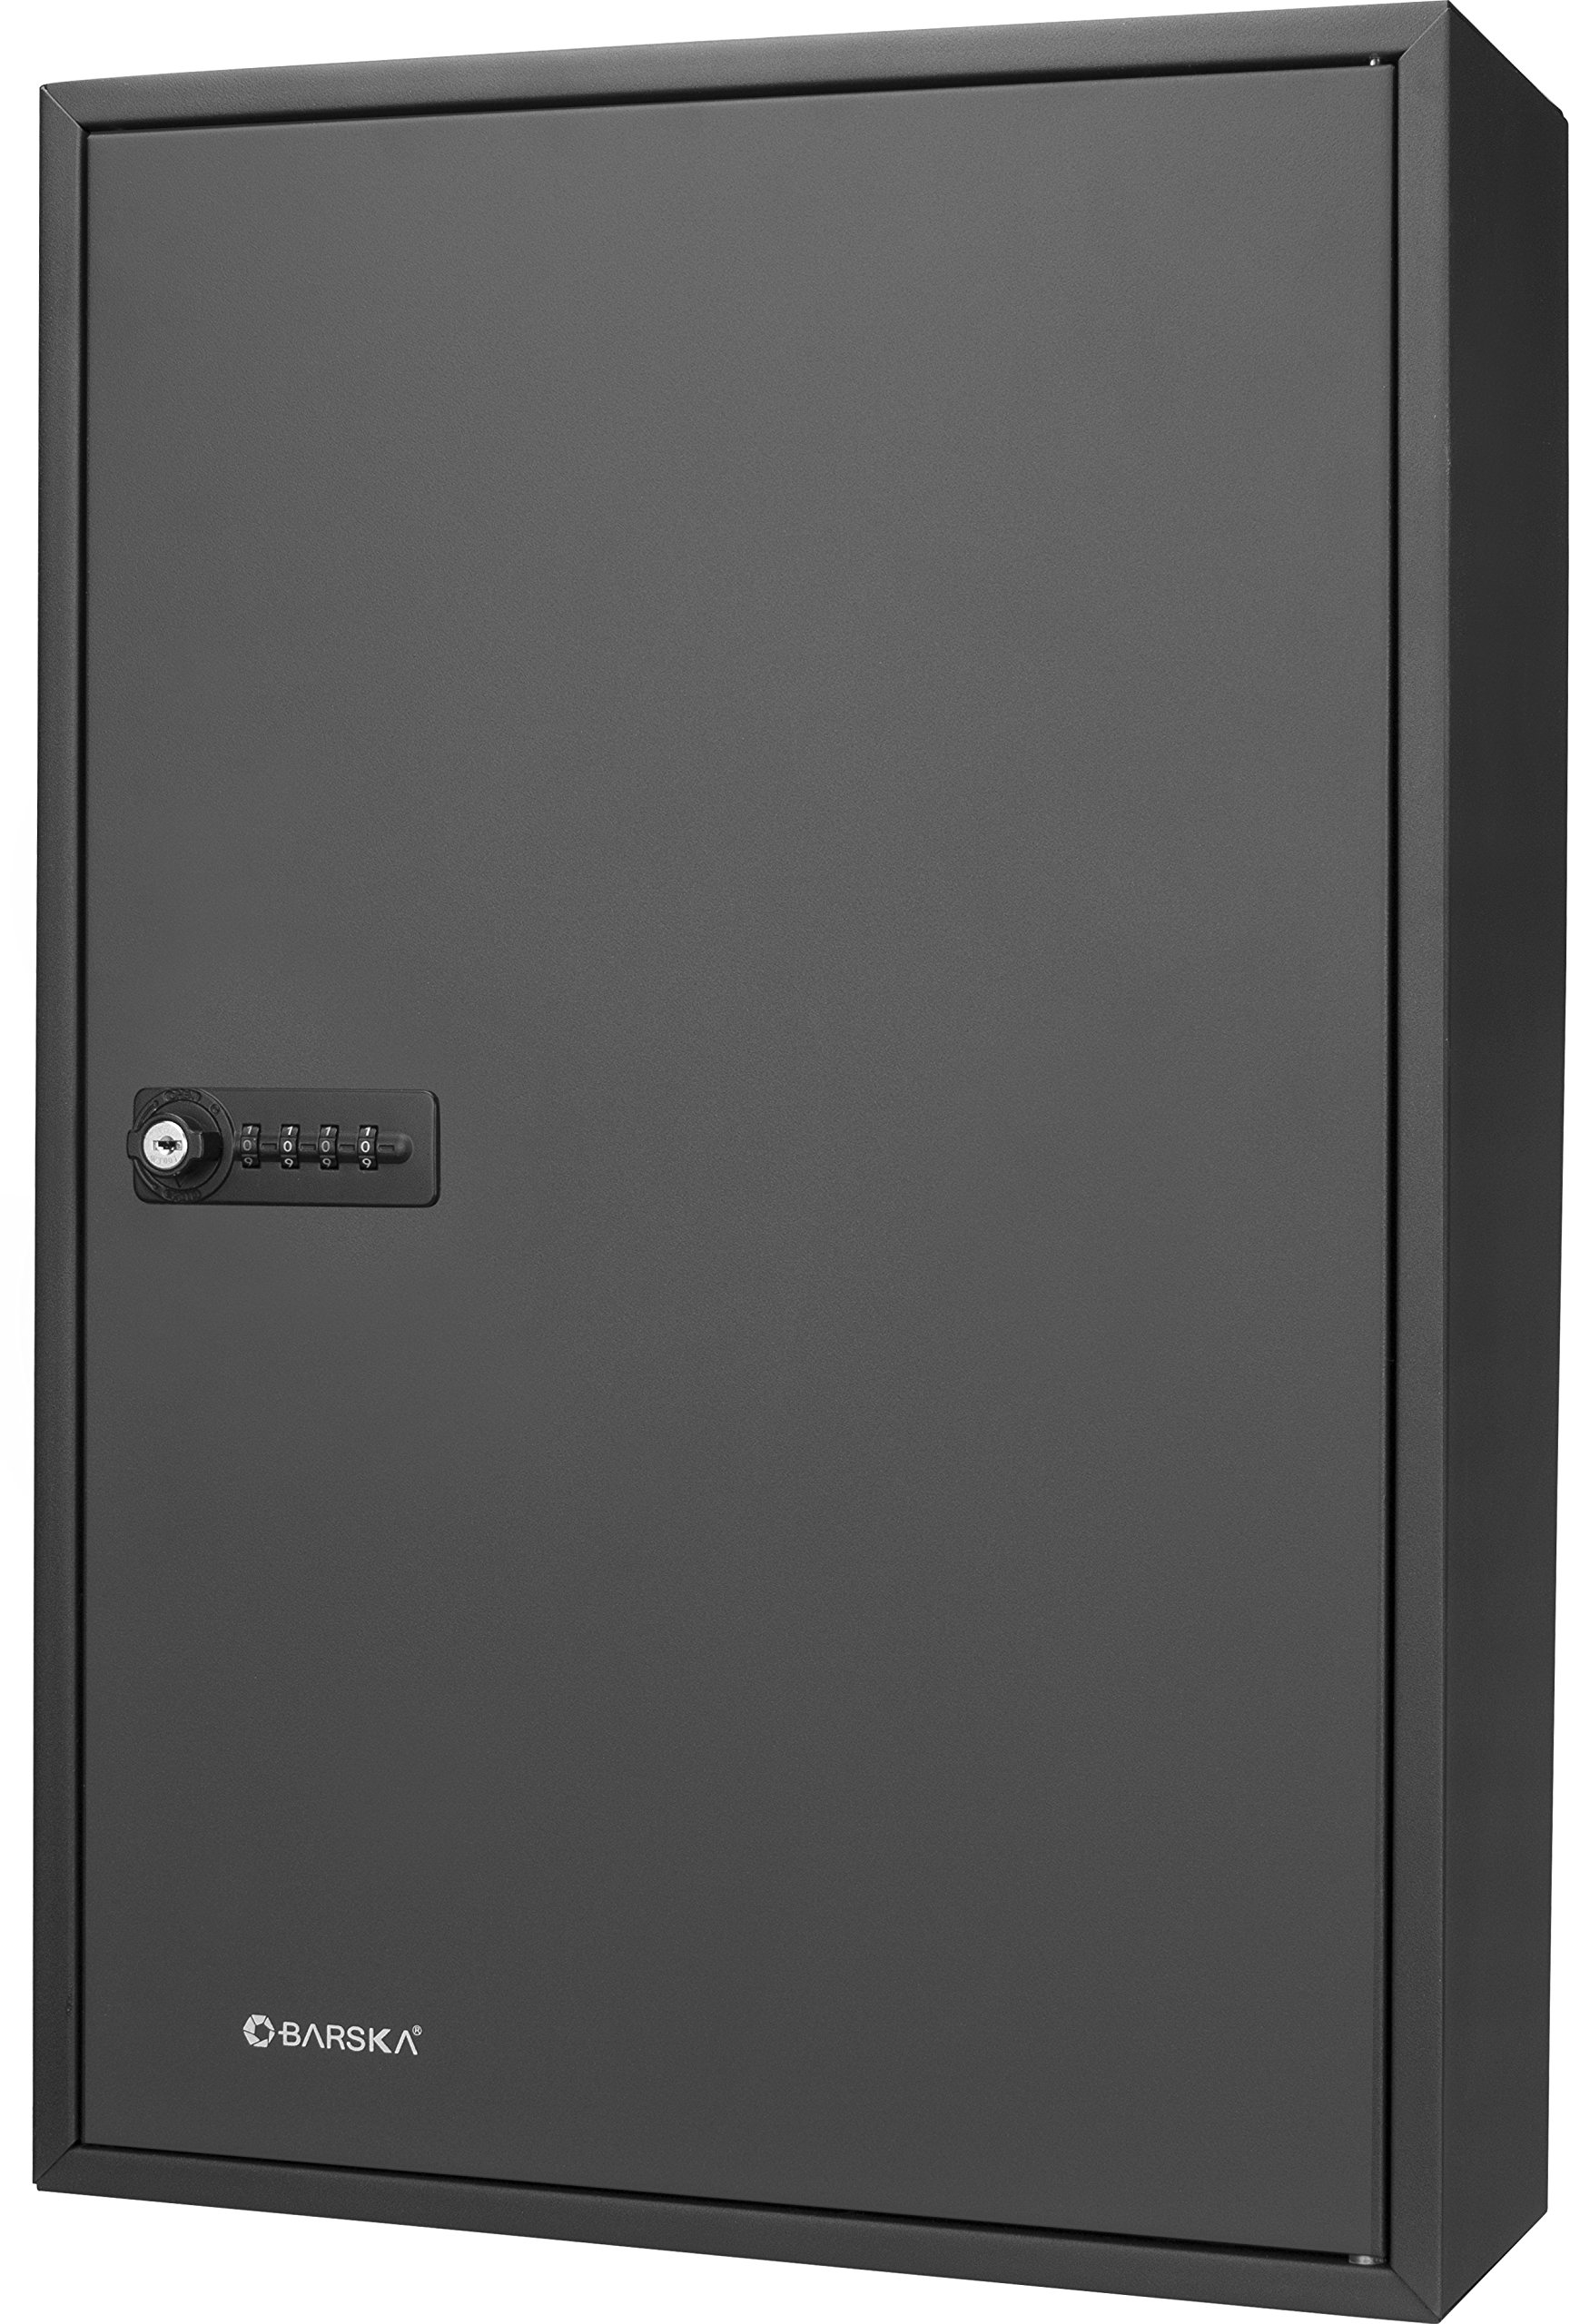 BARSKA CB13266 200 Position Key Cabinet with Combo Lock by BARSKA (Image #1)